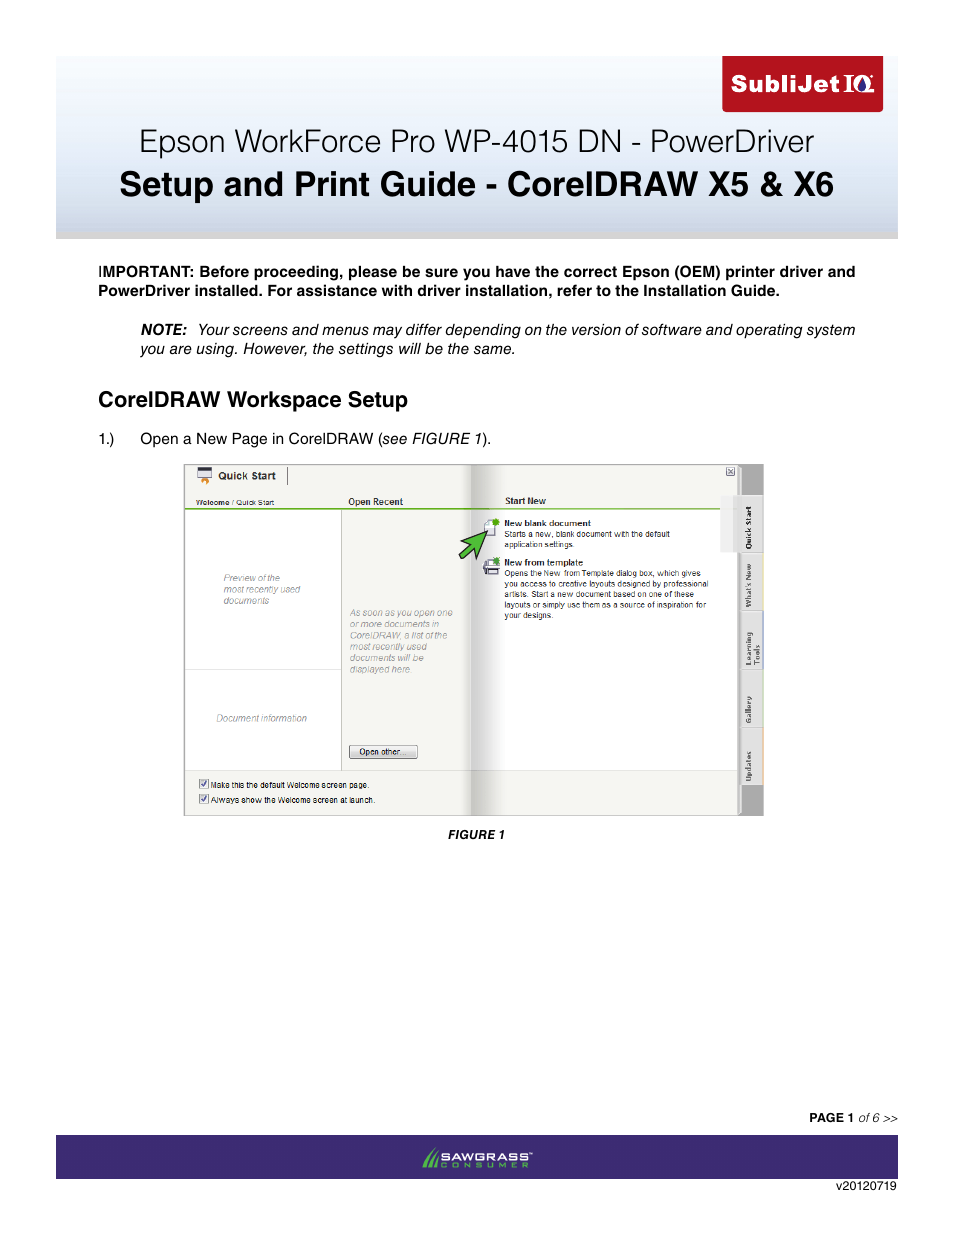 Xpres SubliJet IQ Epson WP-4015 (Power Driver Setup): Print & Setup Guide  CorelDRAW X5 - X6 User Manual | 6 pages